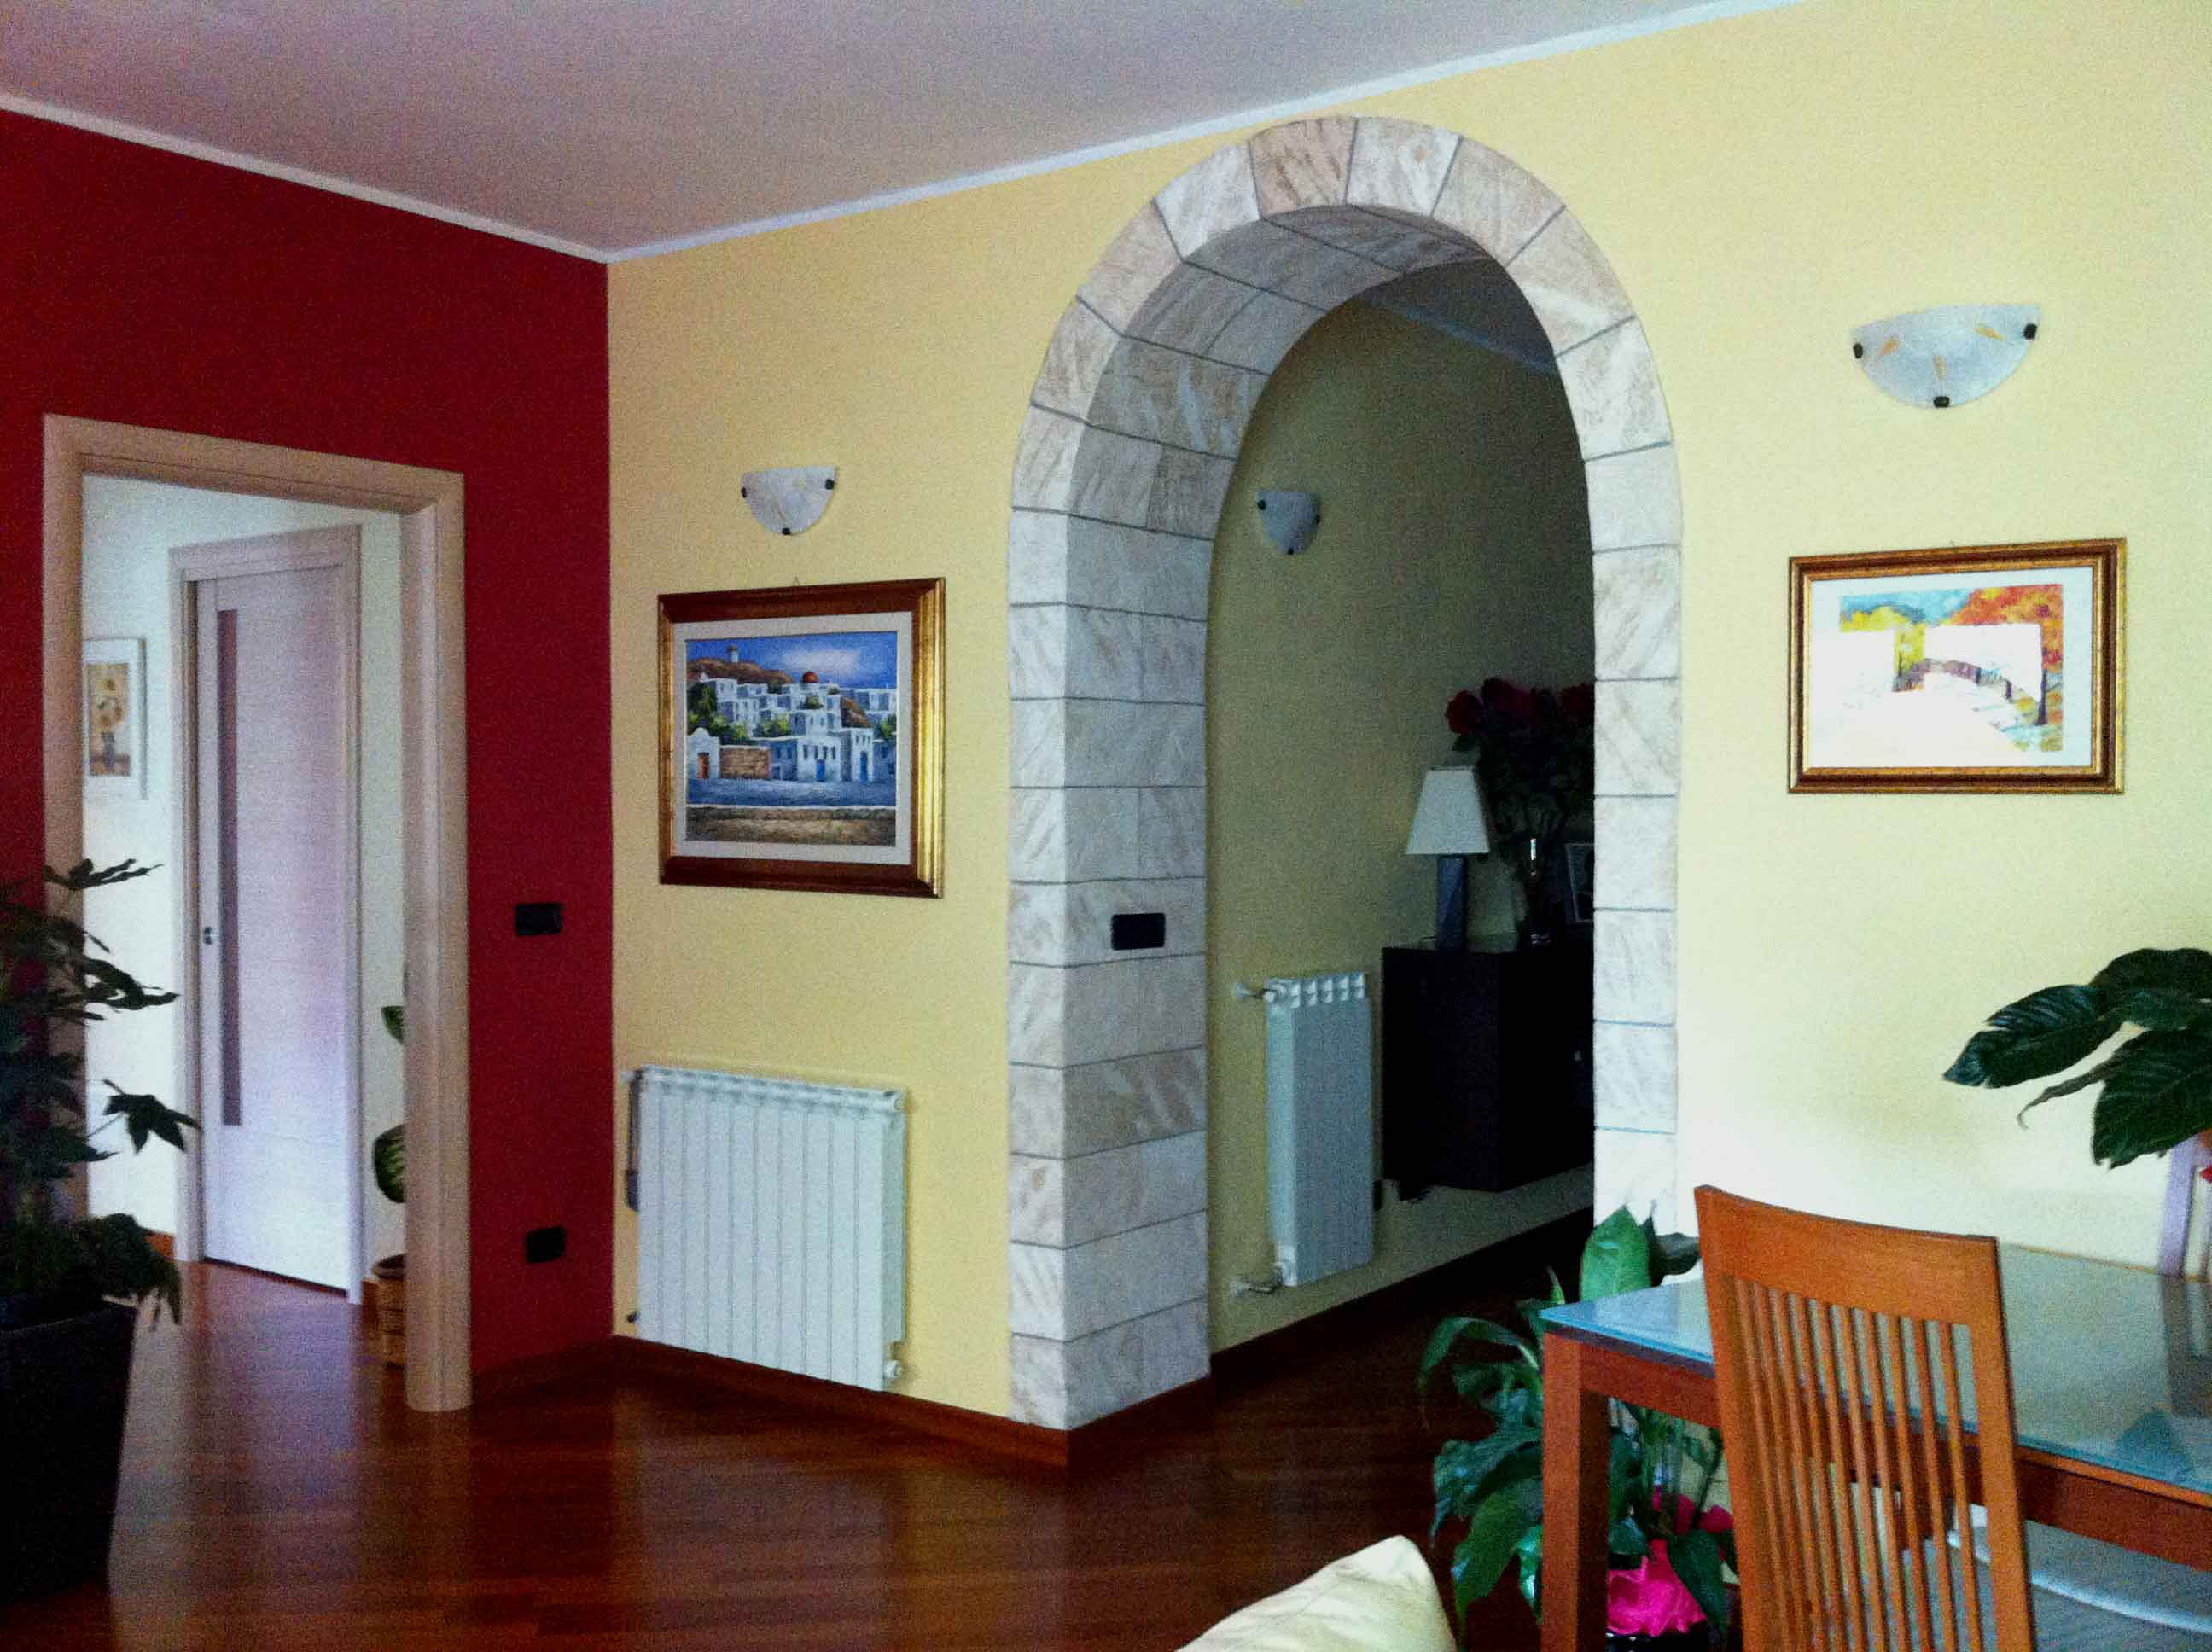 archi interni casa gx17 regardsdefemmes